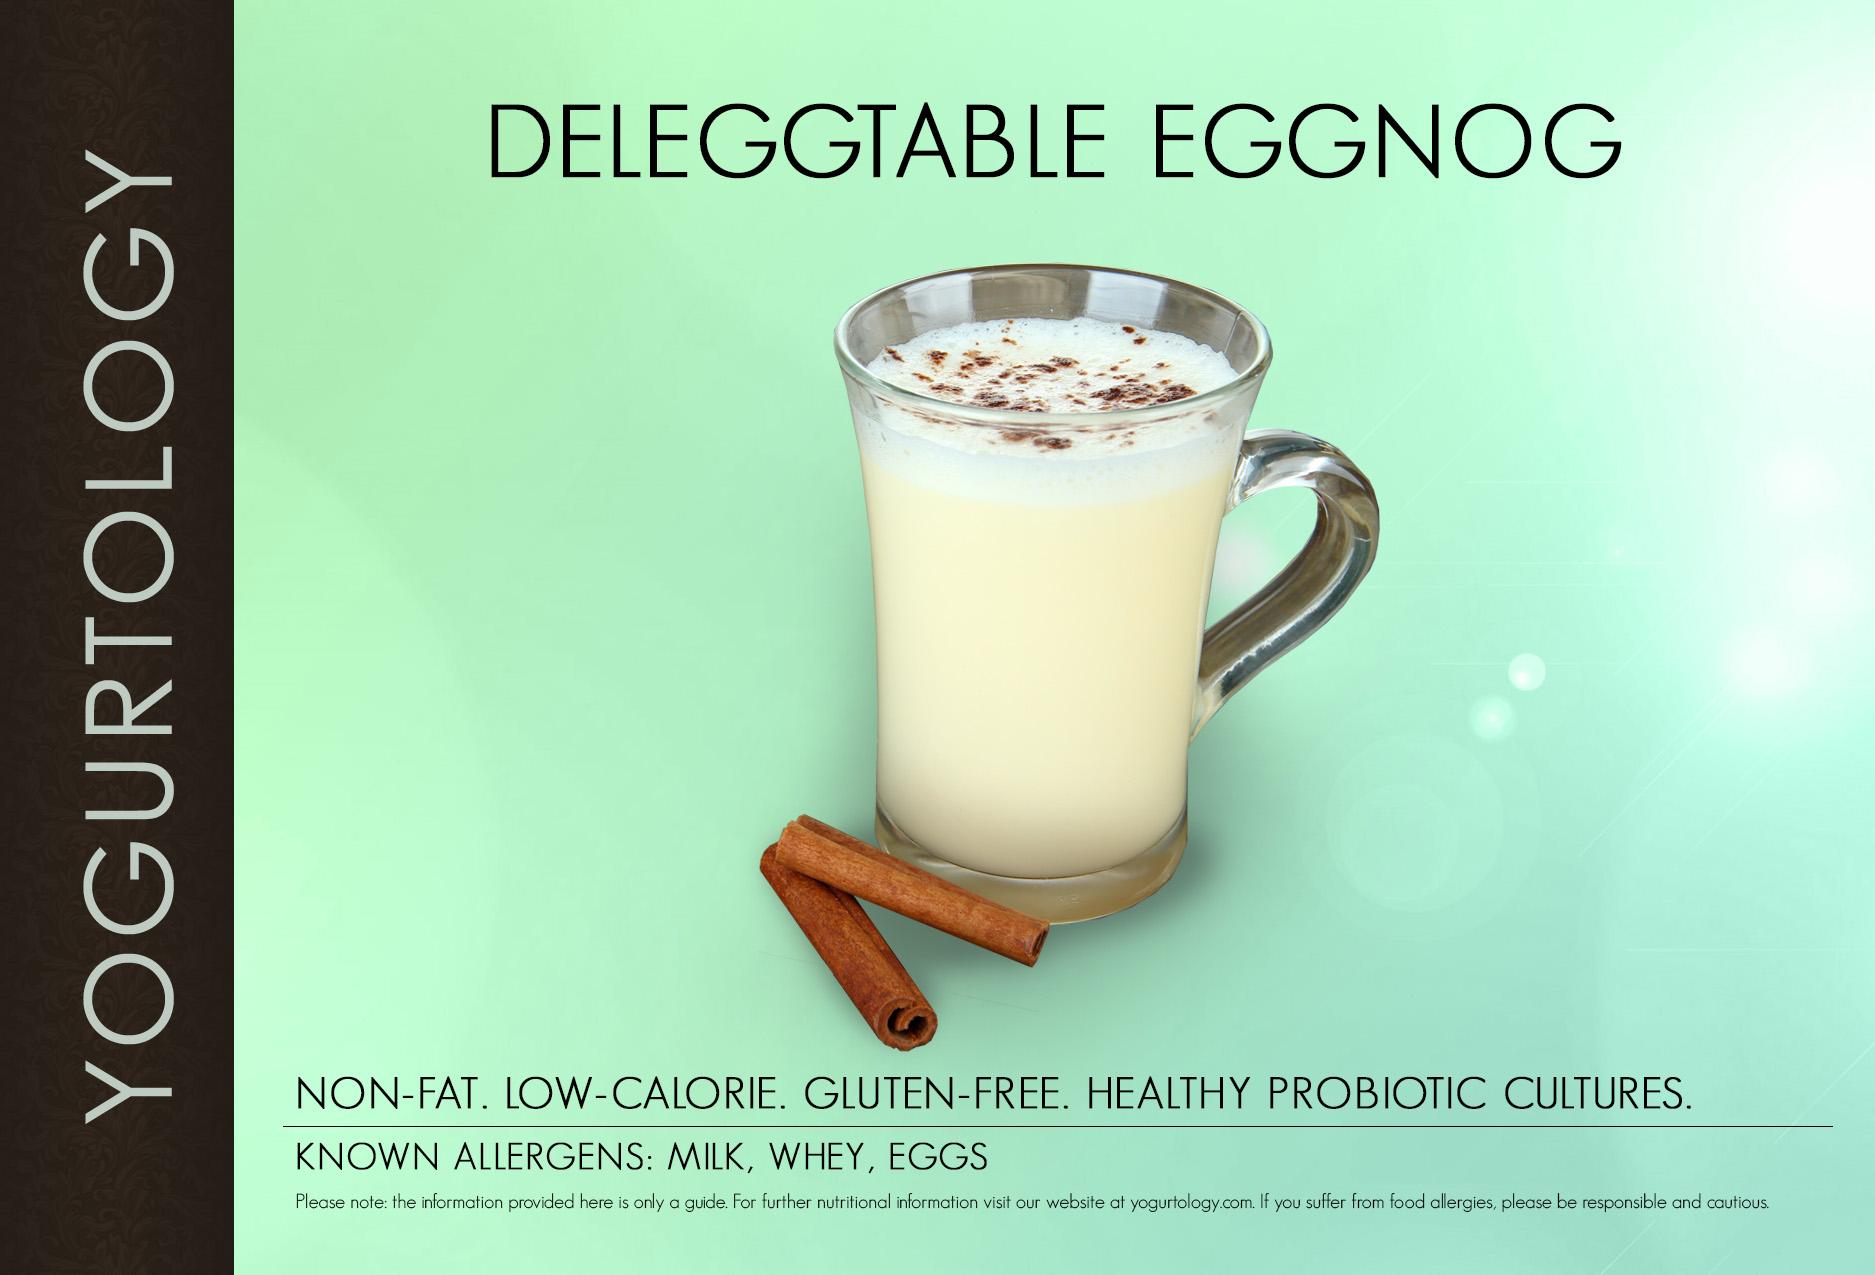 Deleggtable Eggnog